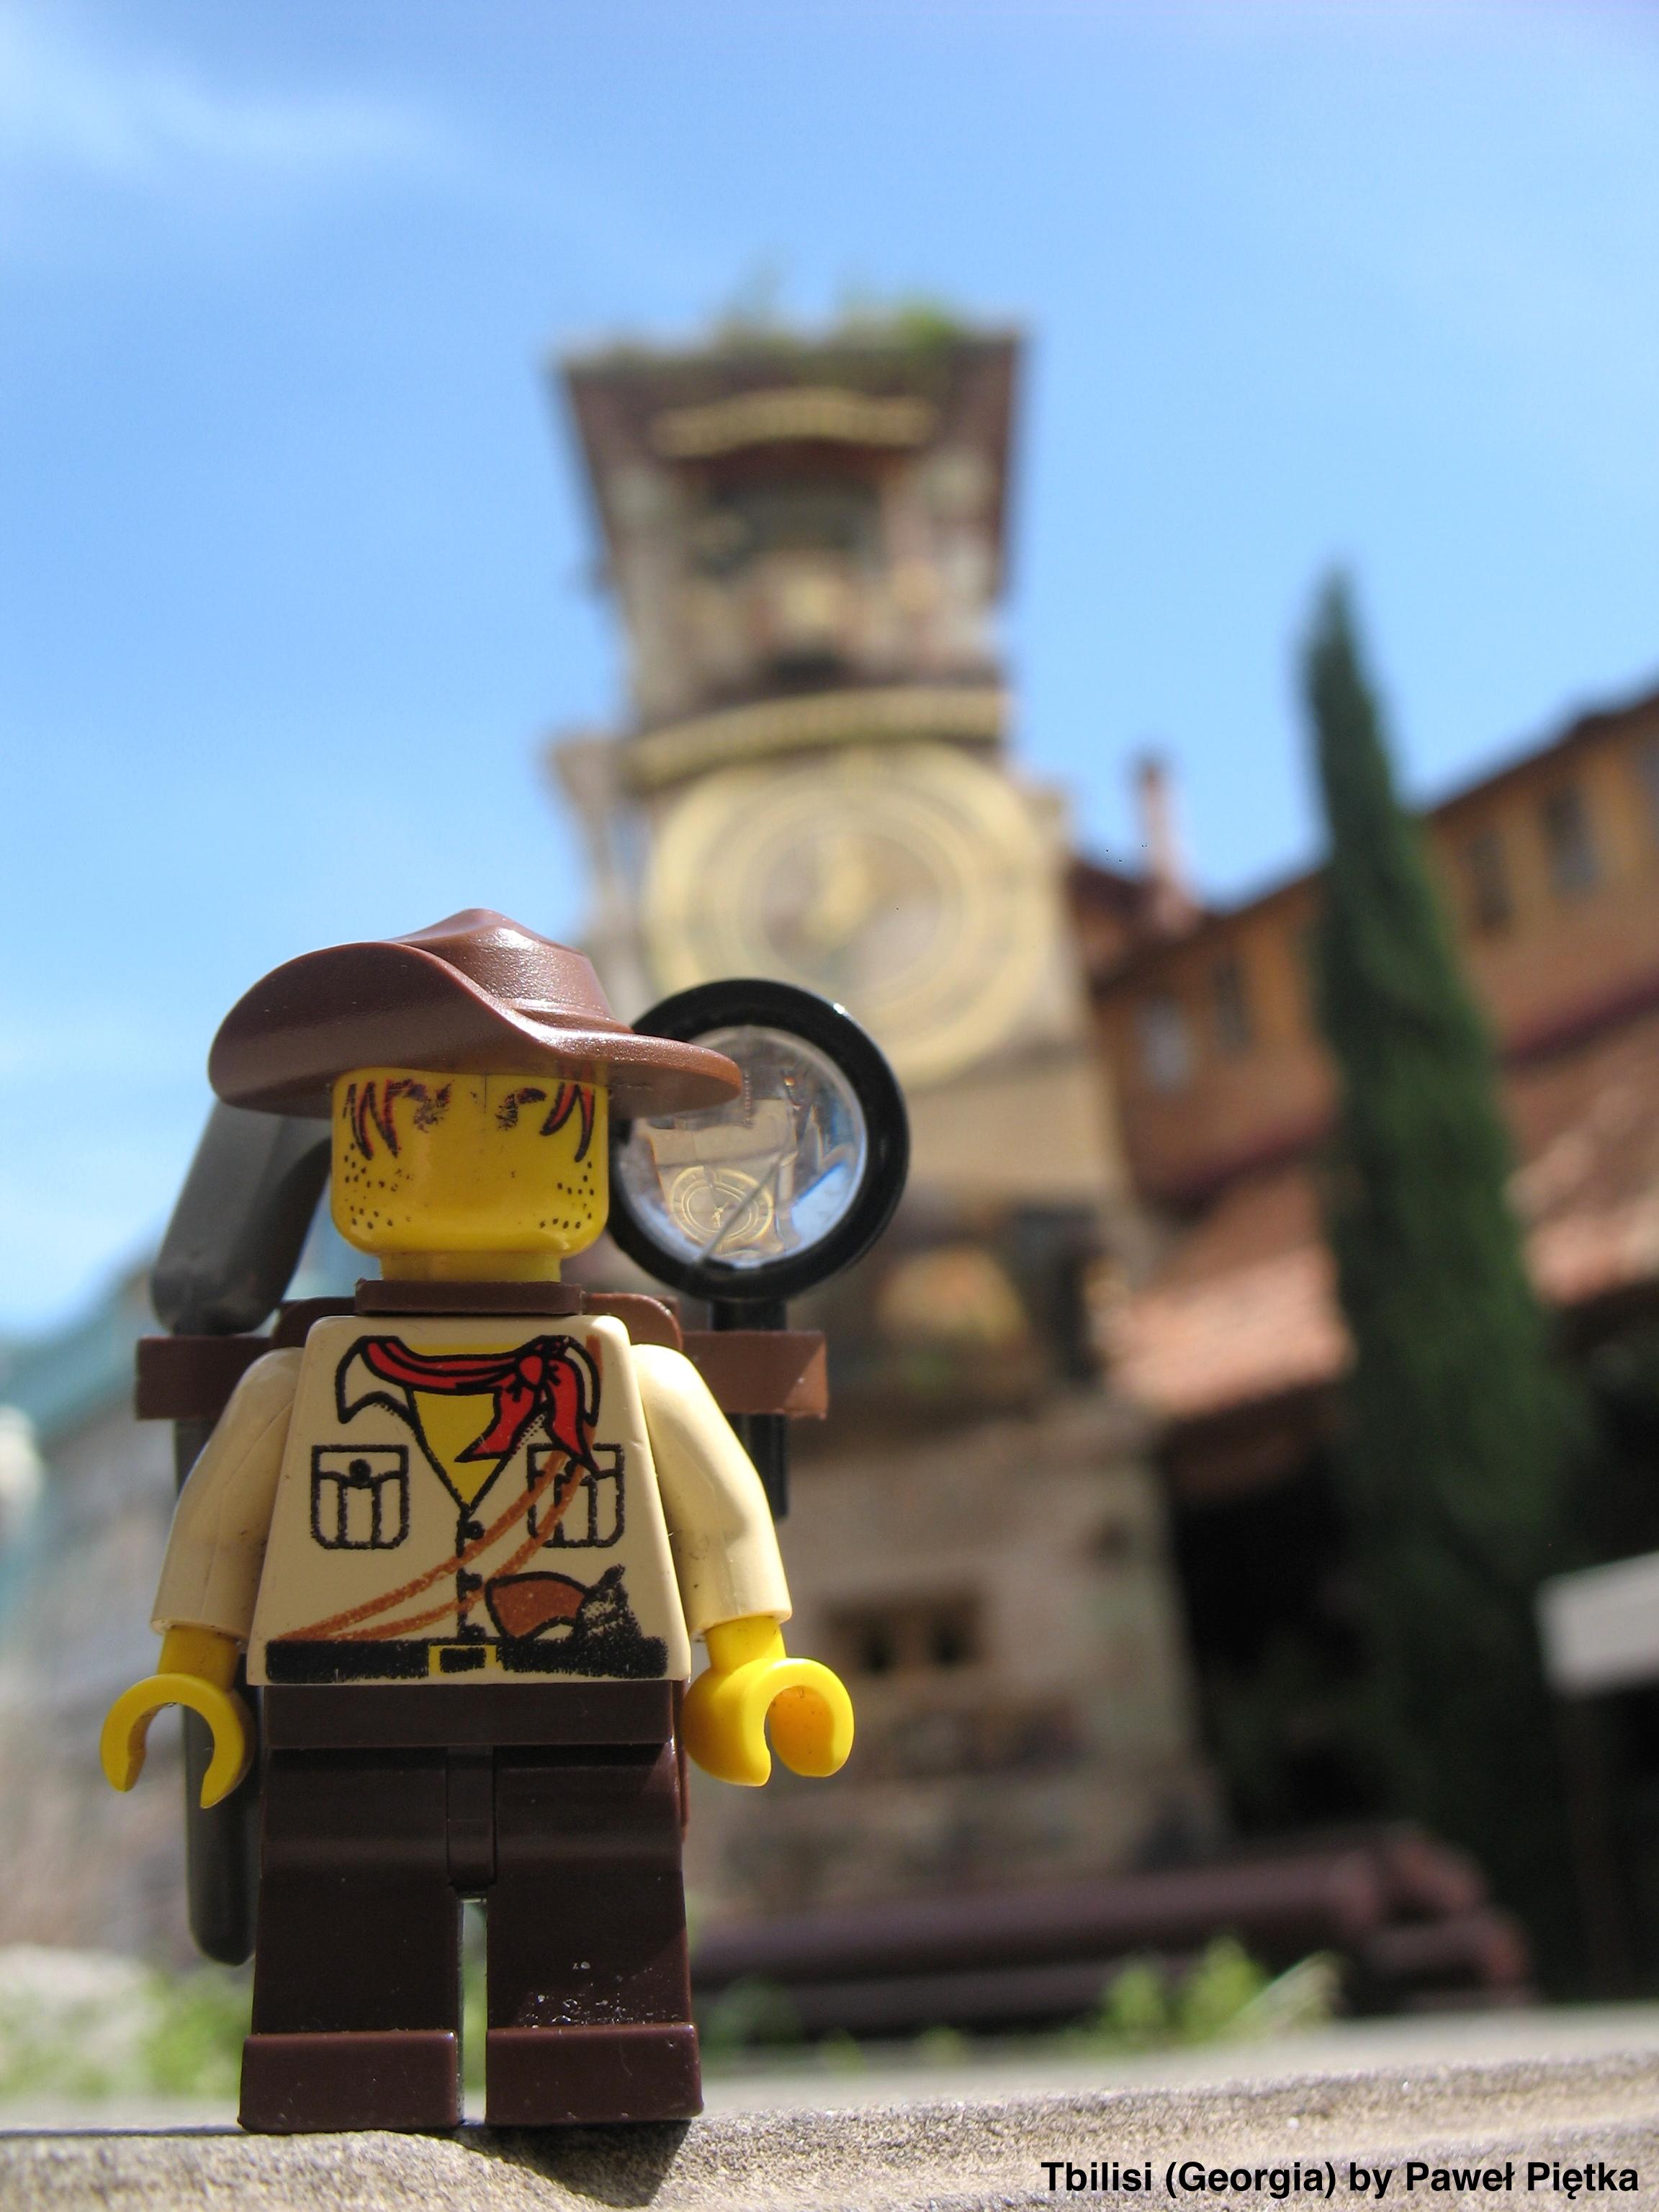 Georgia Tbilisi Lego Amp Travel Pawel S Travels